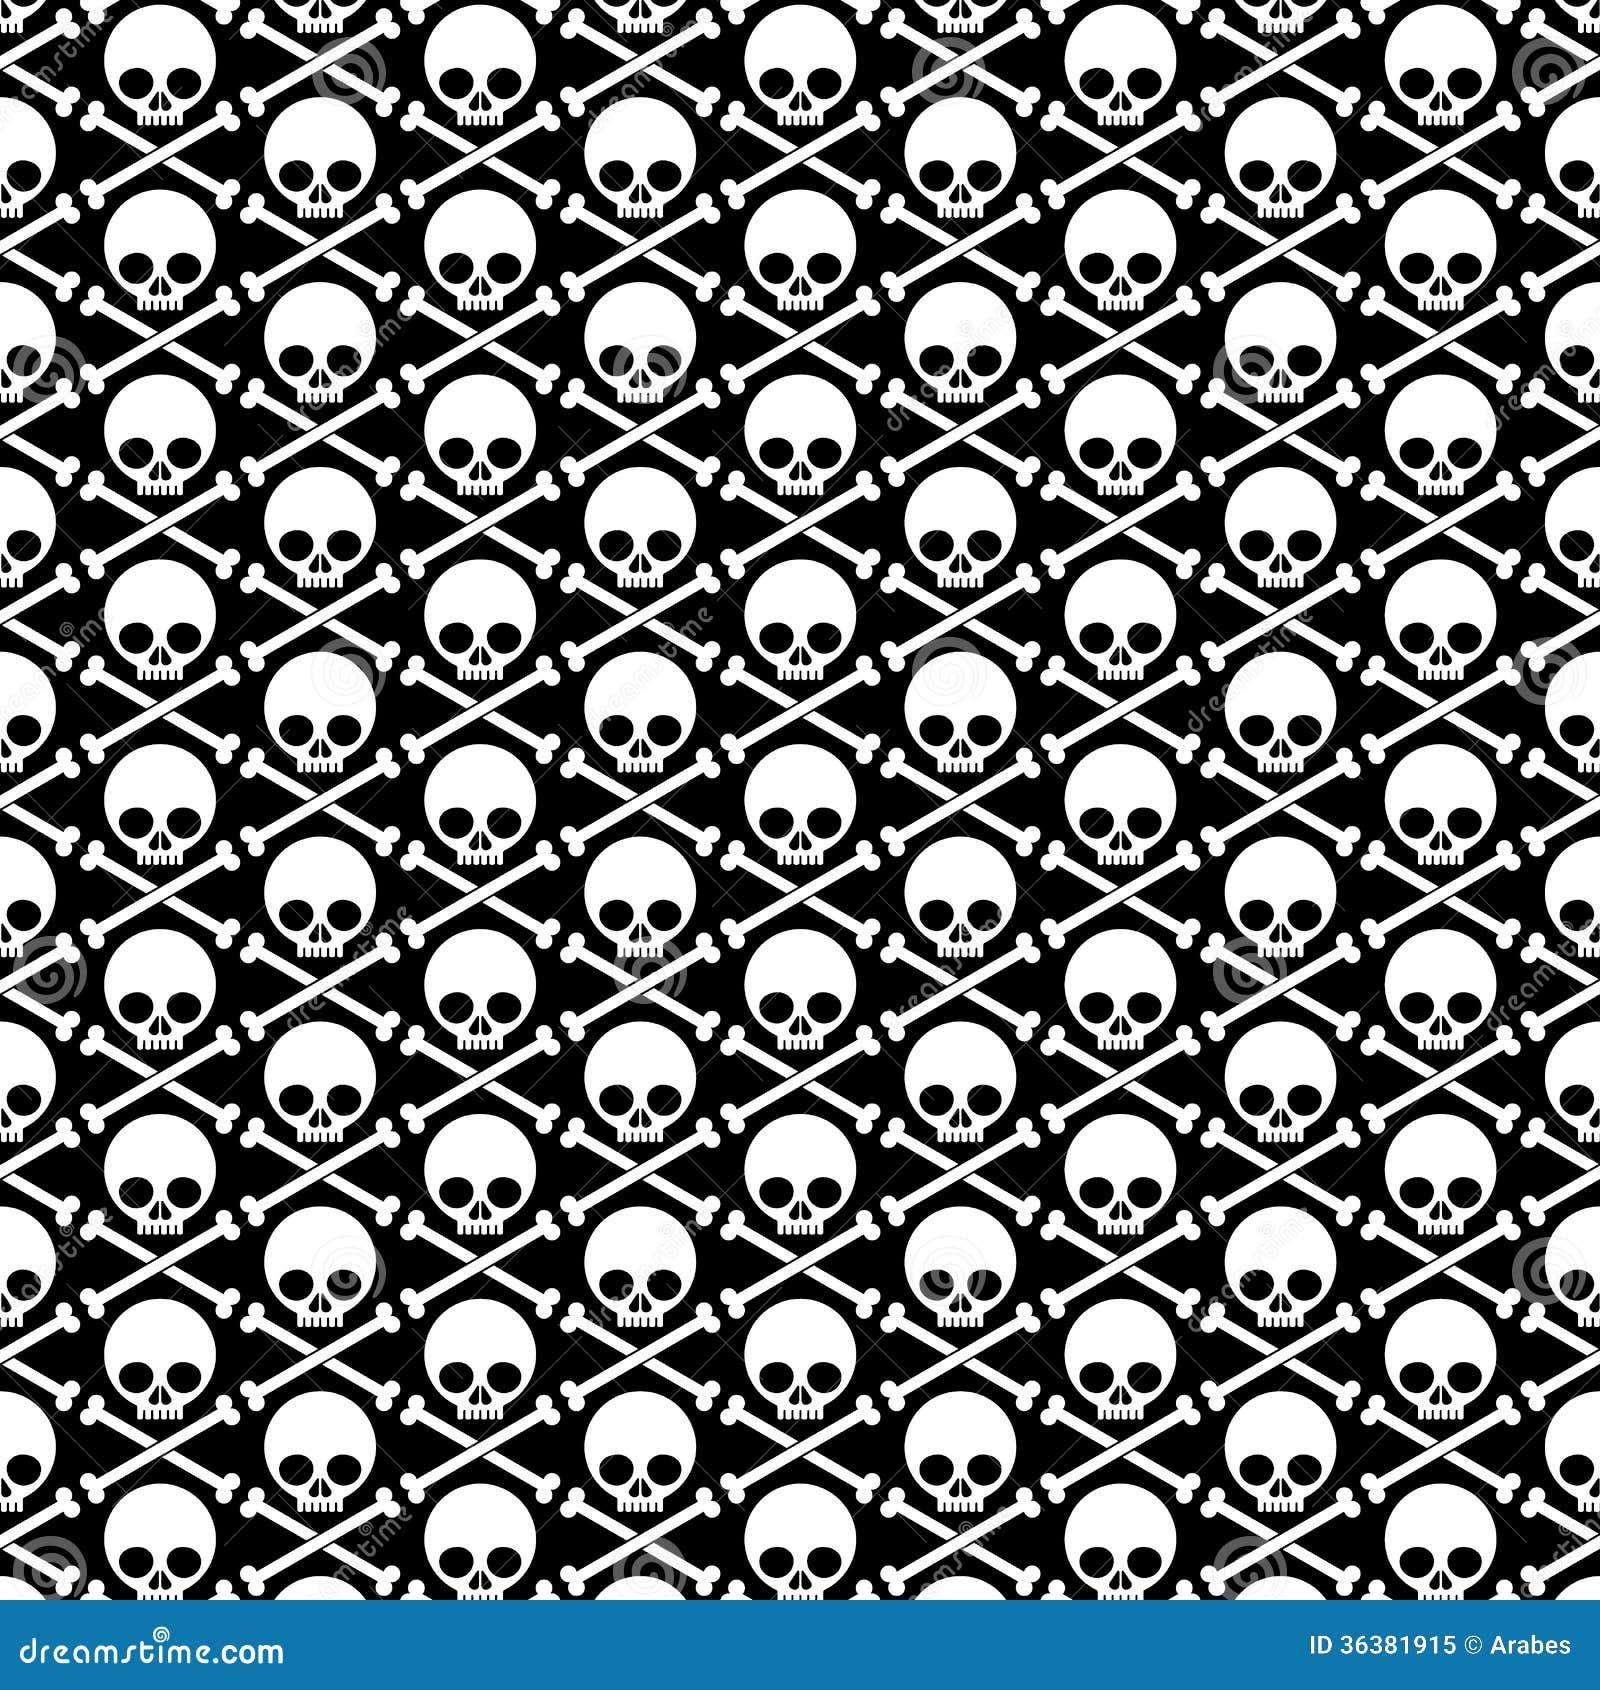 Skull And Crossbones Background Stock Vector Illustration Of Sign